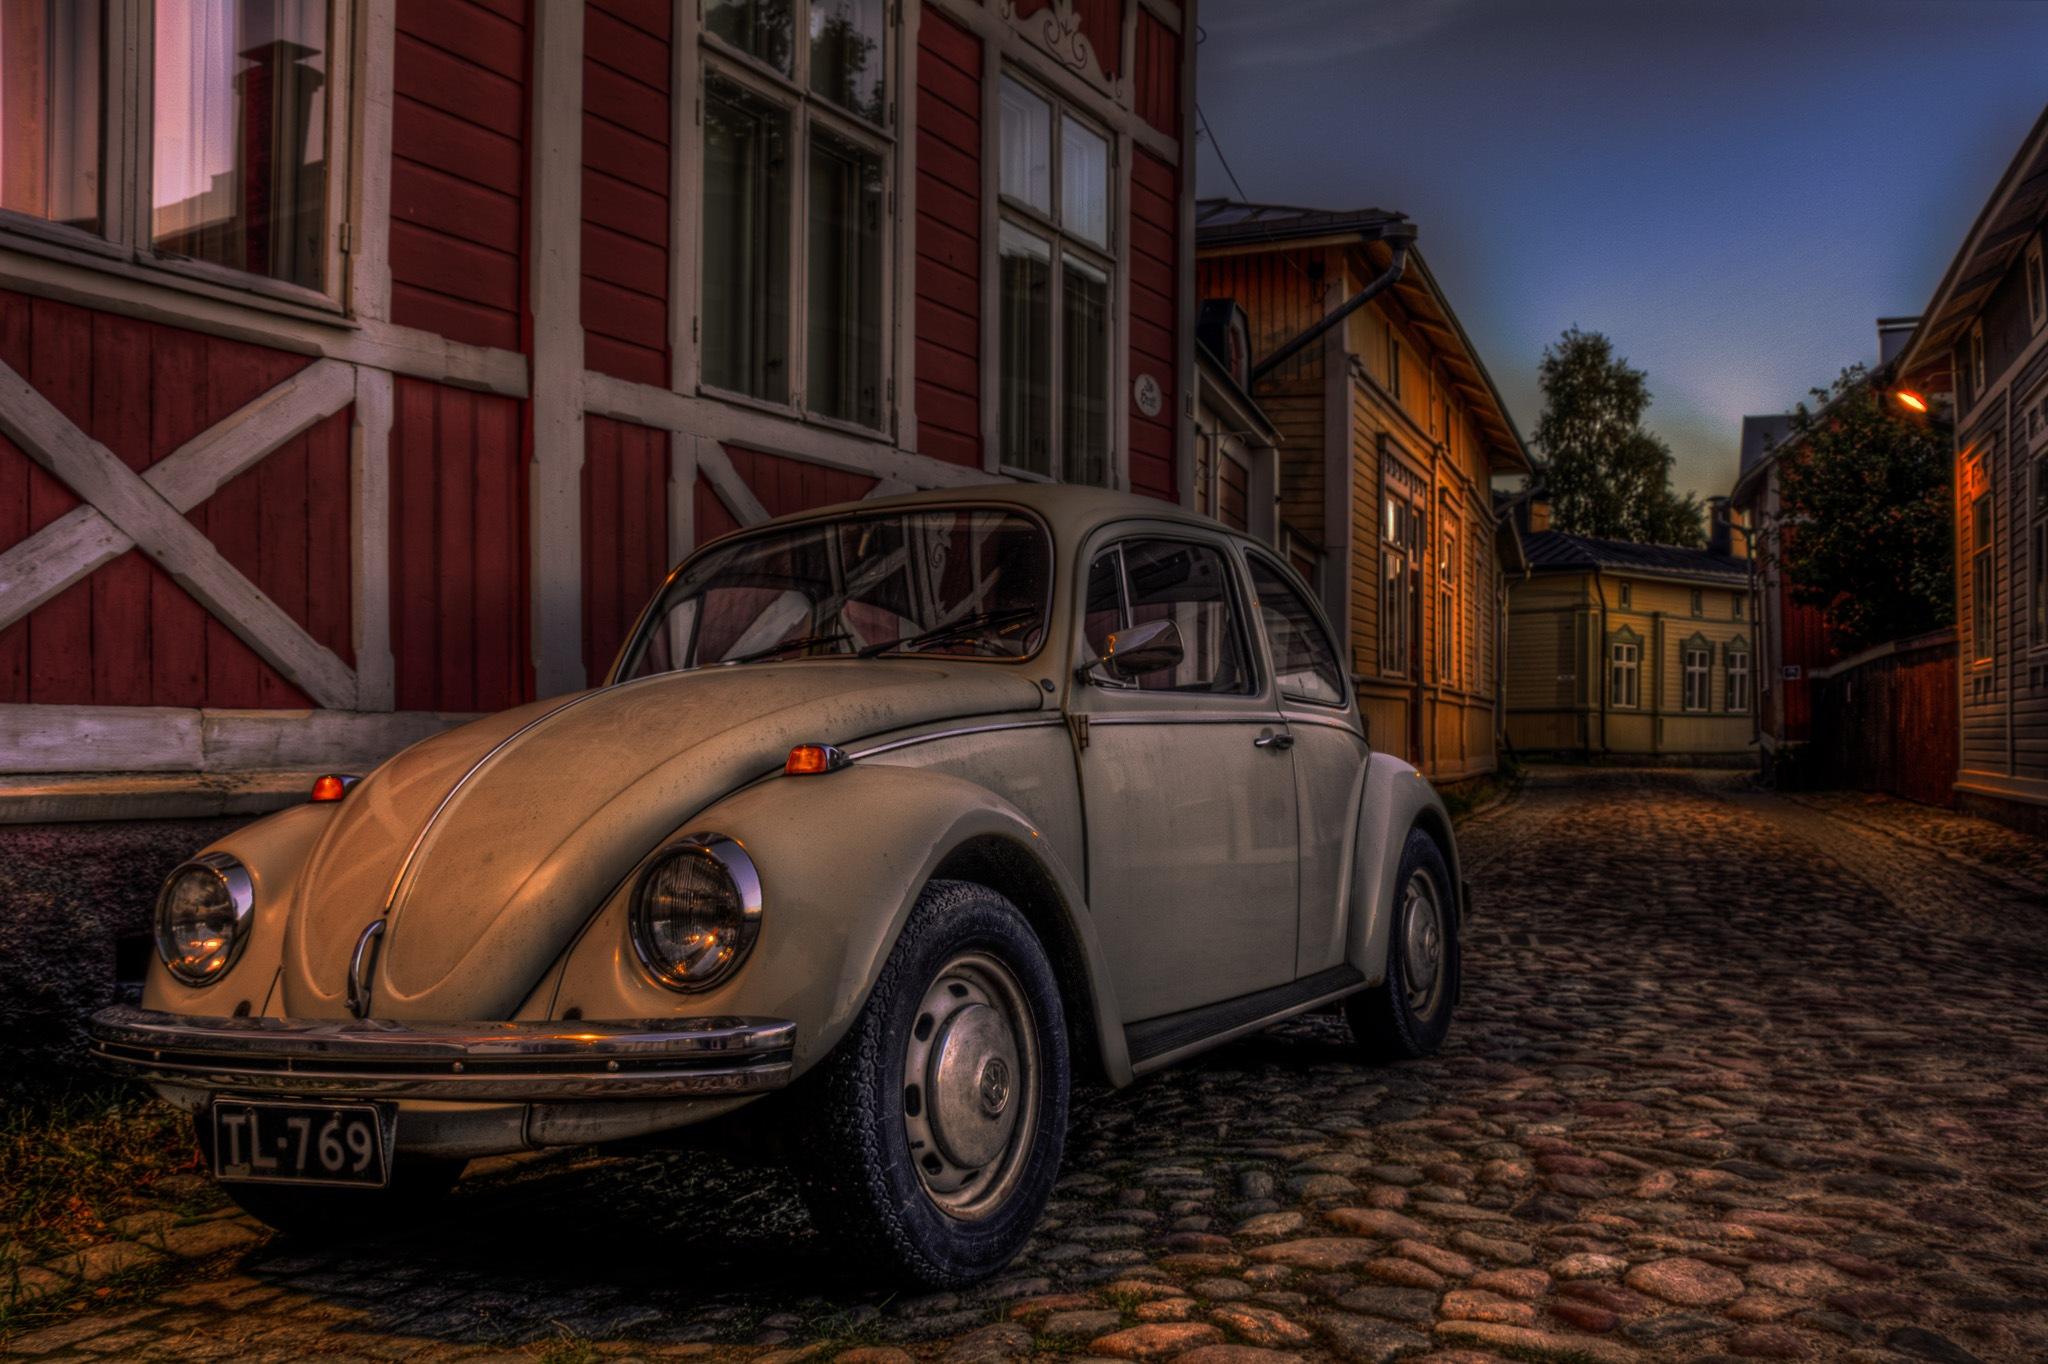 Beetle in Rauma by bojan.bilas